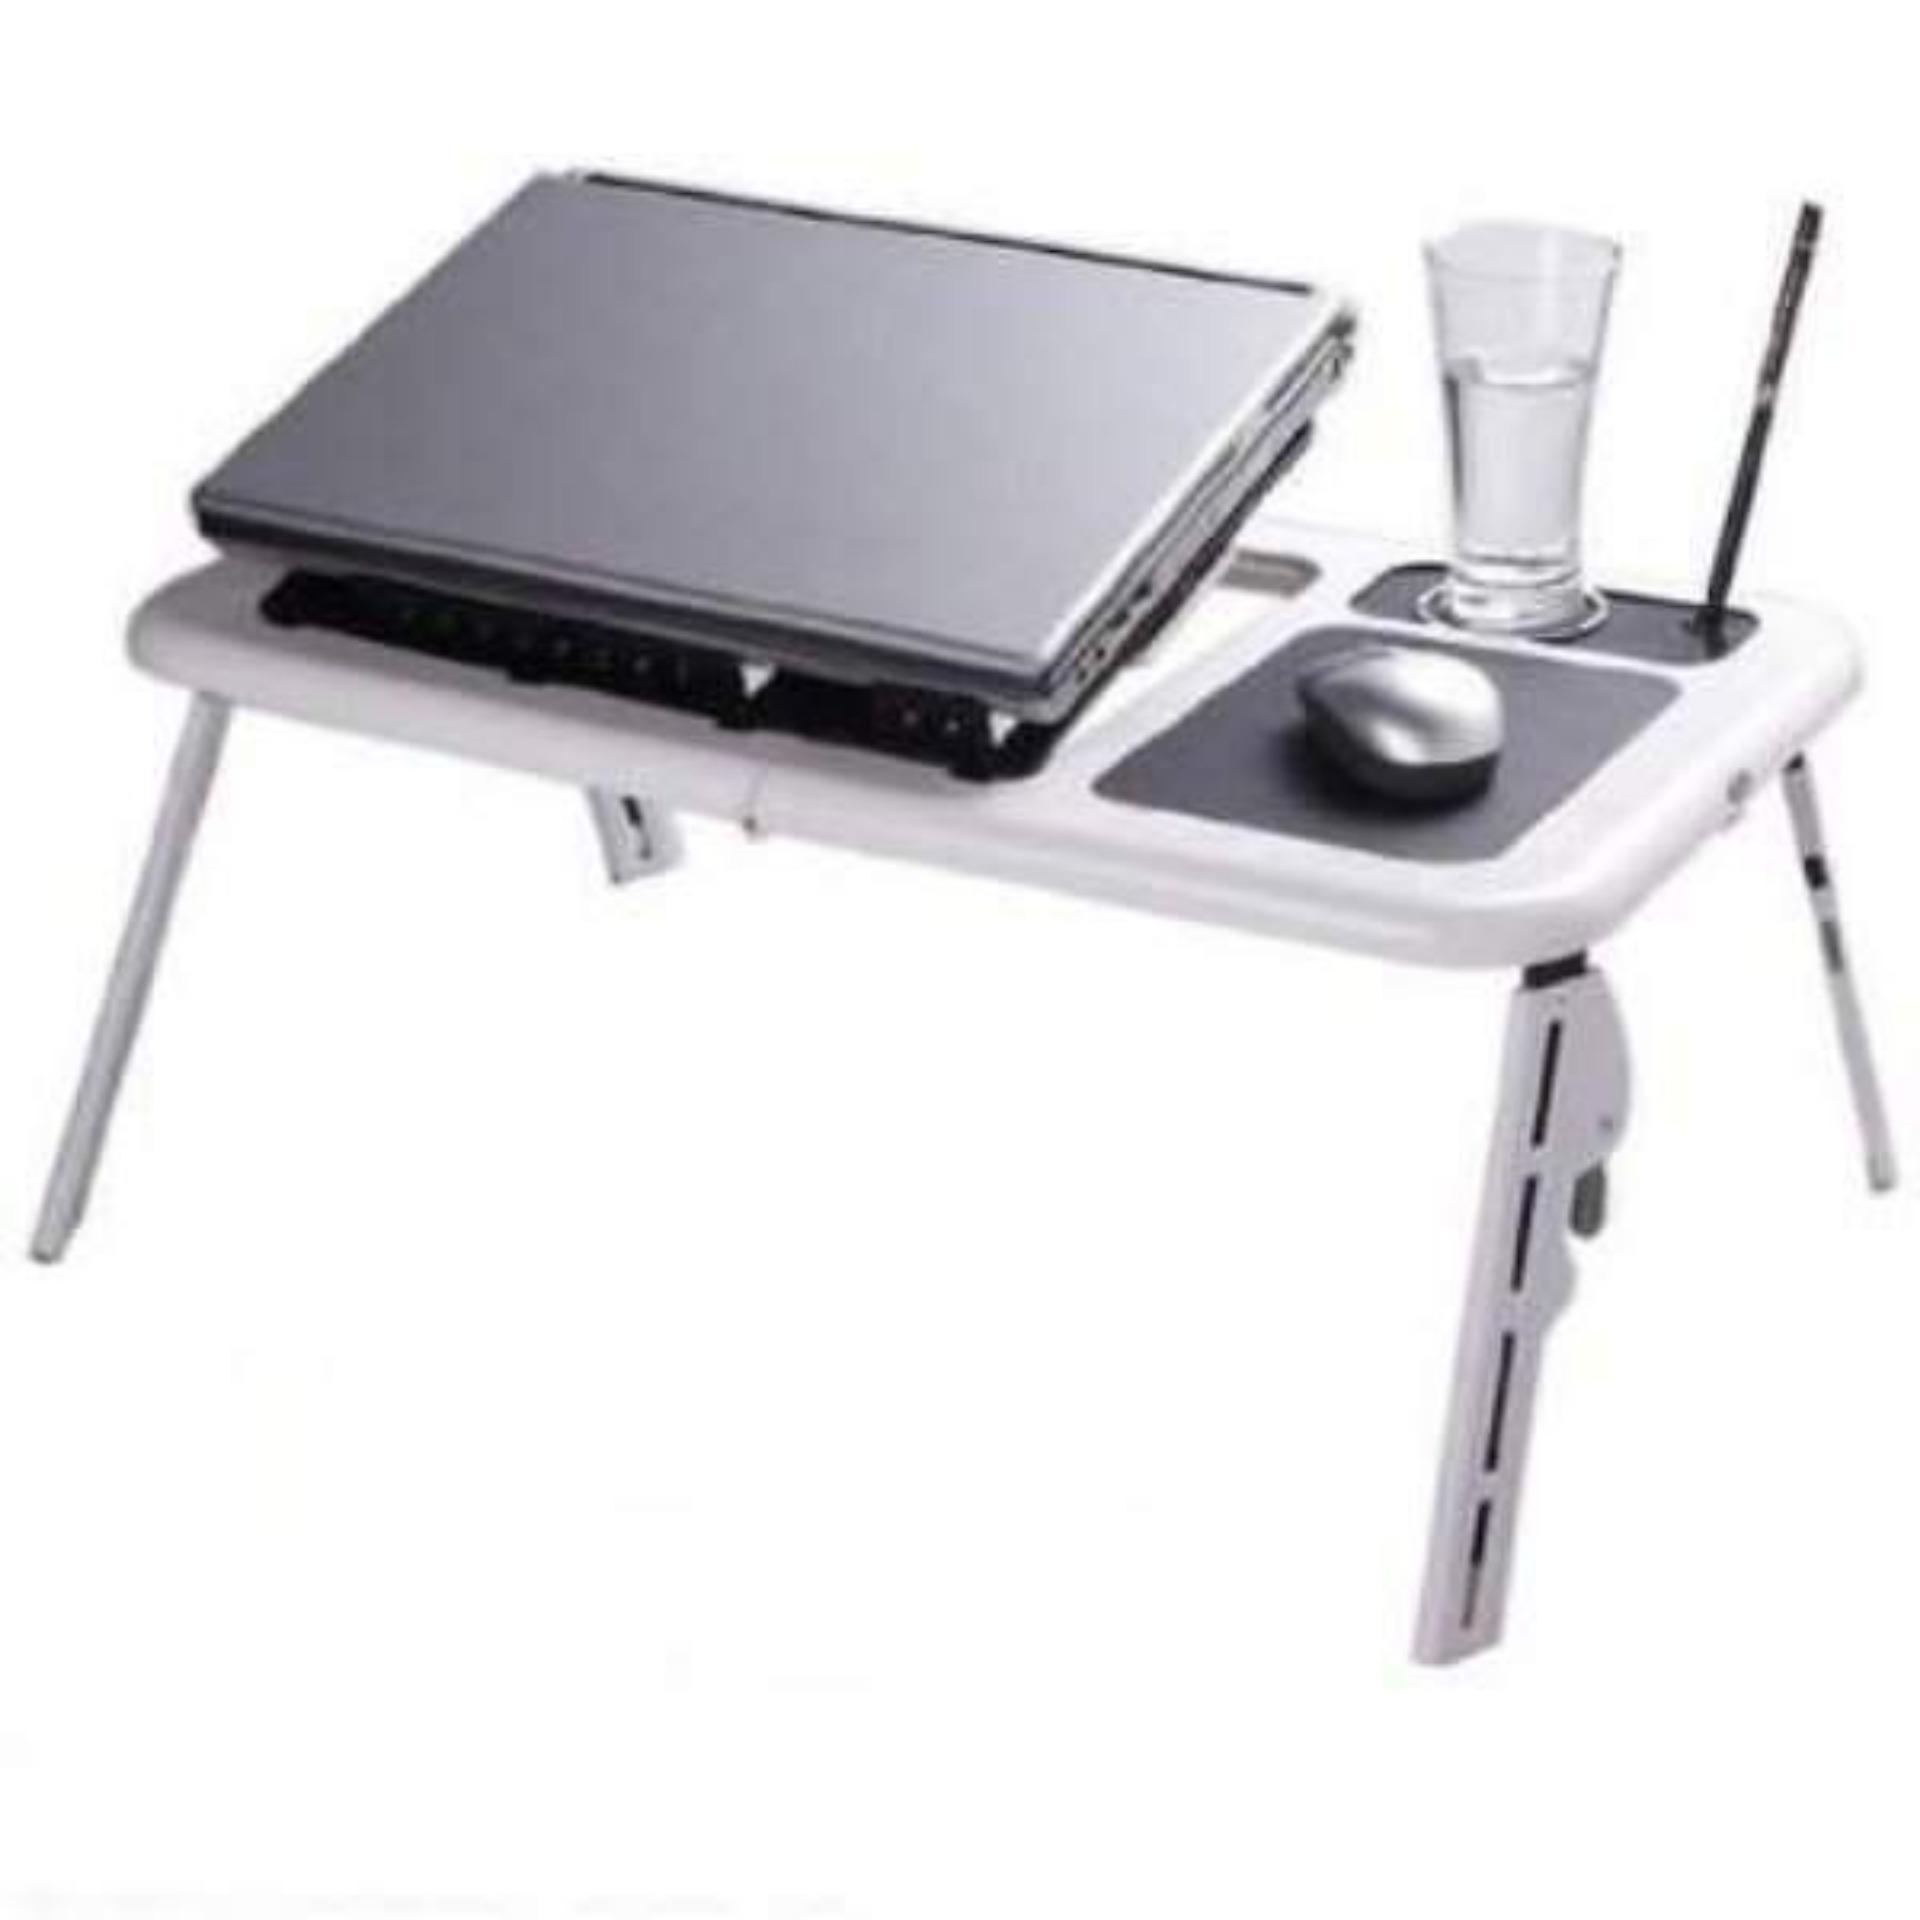 E-Table Meja Laptop Portable / Meja Laptop Lipat / Meja Laptop Praktis Mudah Dibawa Kemana mana - Putih